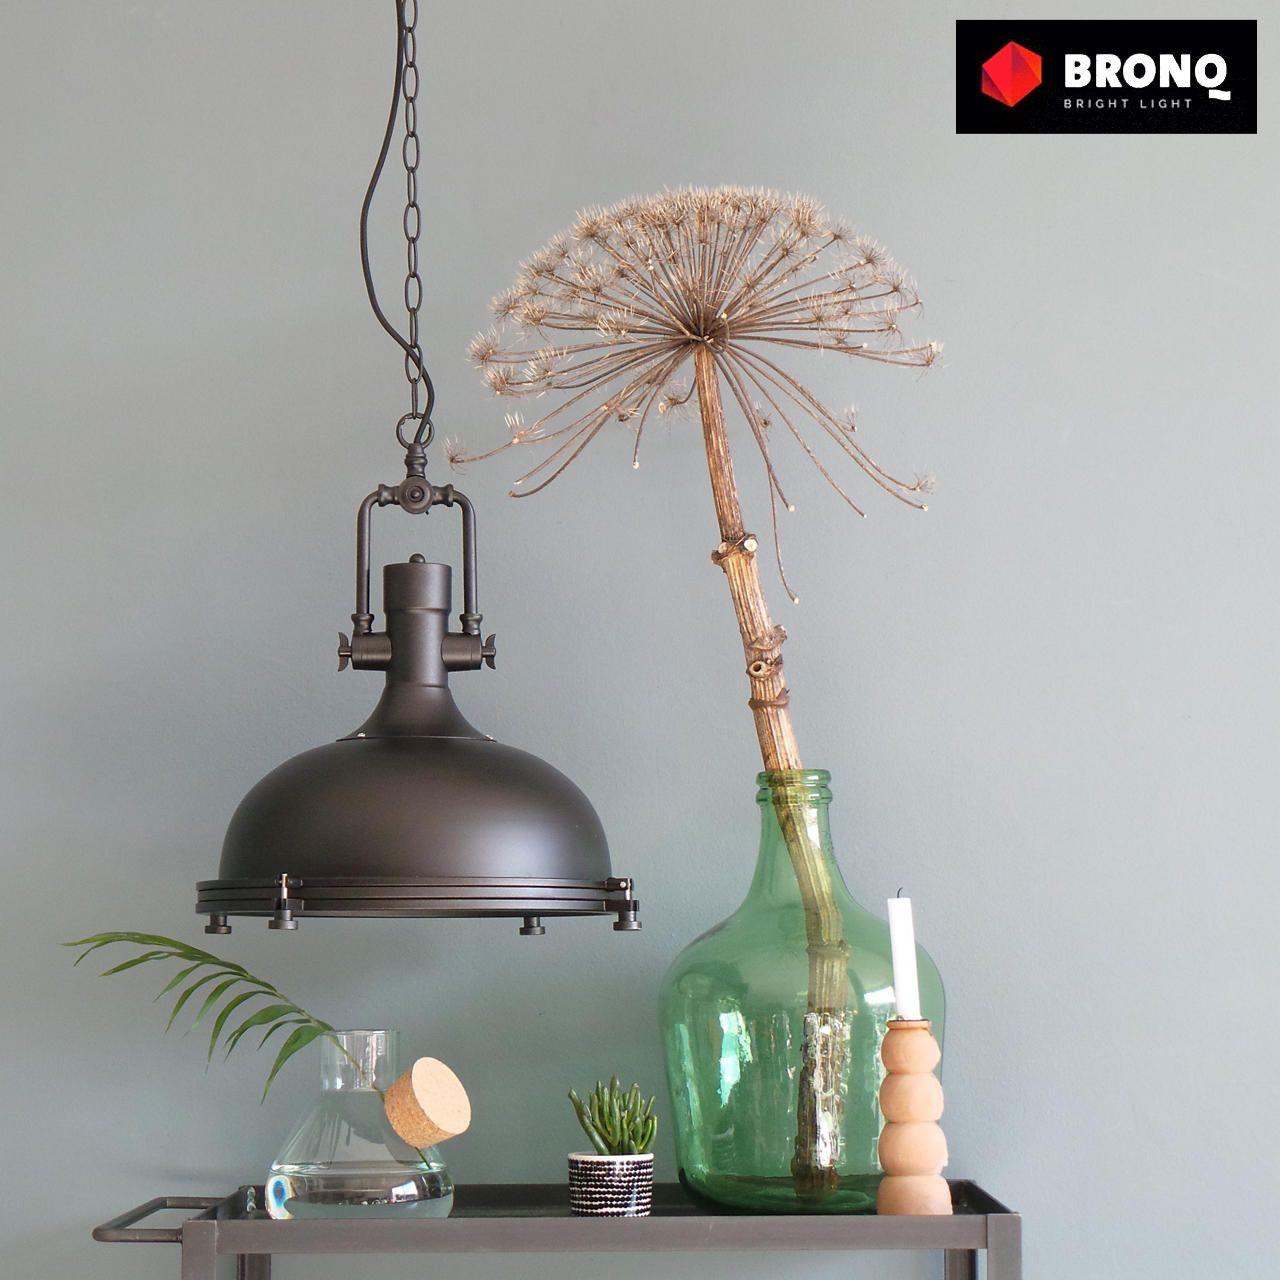 Bruine Landelijk Industriele Hanglamp O40cm Lampenconcurrent Nl